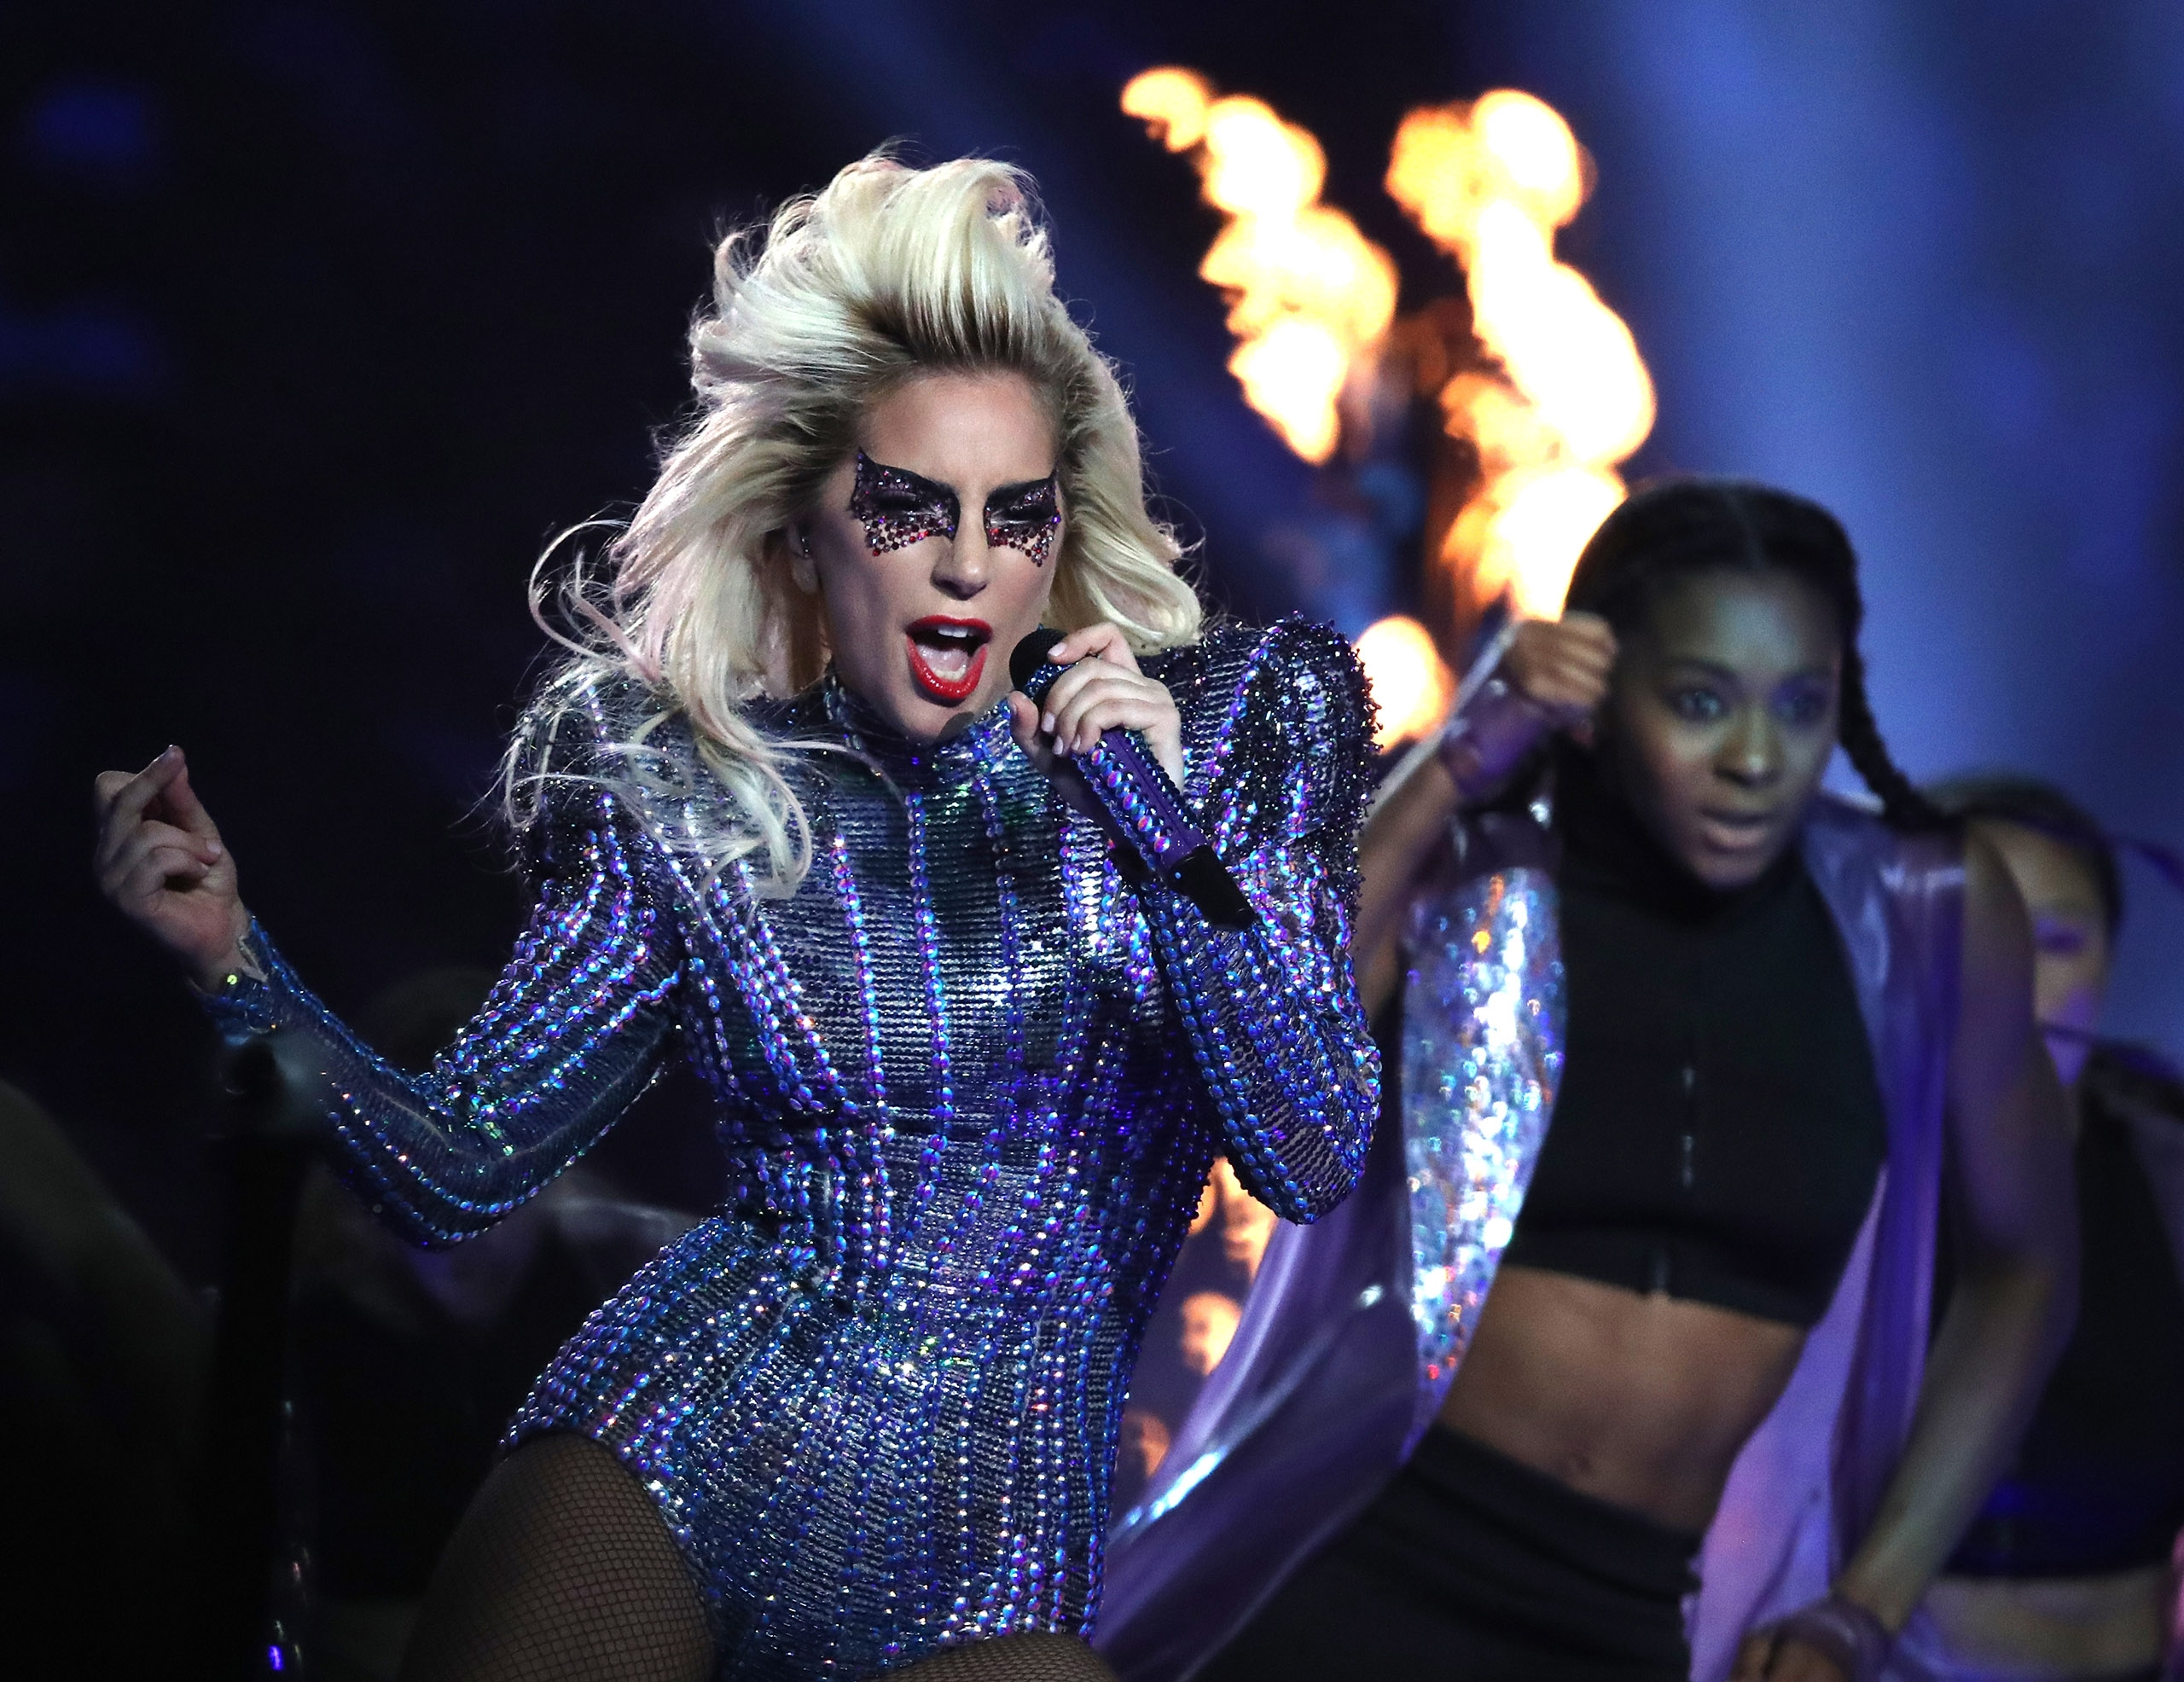 Super Bowl Halftime Show: Lady Gaga Show Review | Time pertaining to Lady Gaga Super Bowl 2018